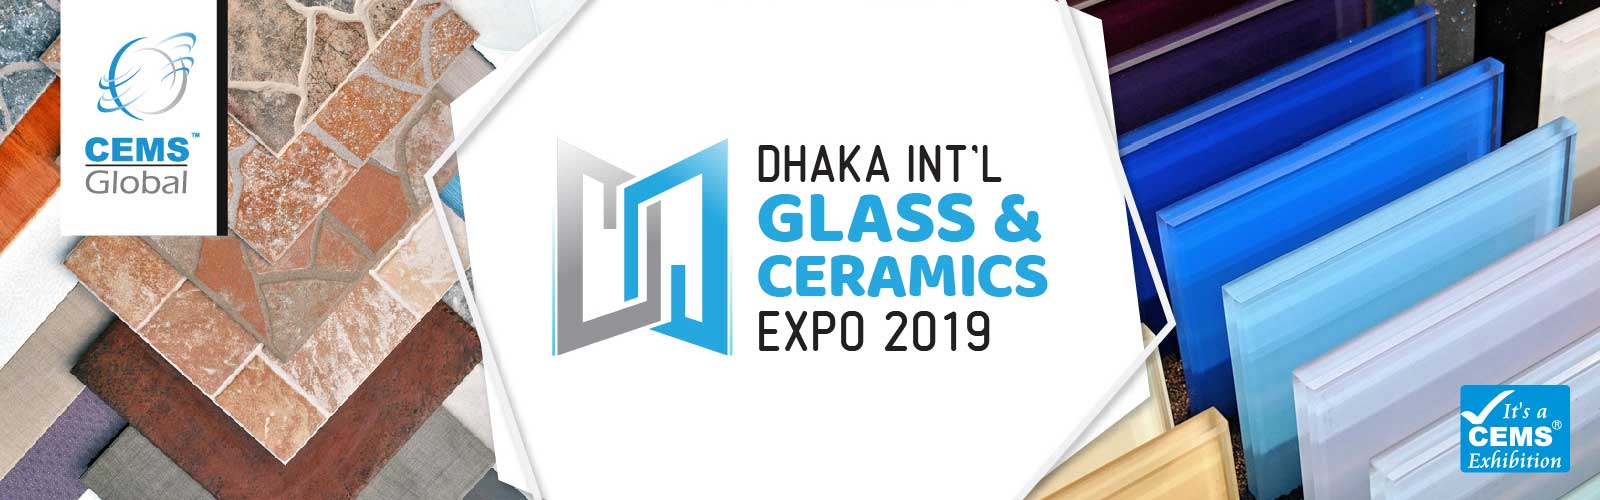 Dhaka International Glass & Ceramics Expo 2019